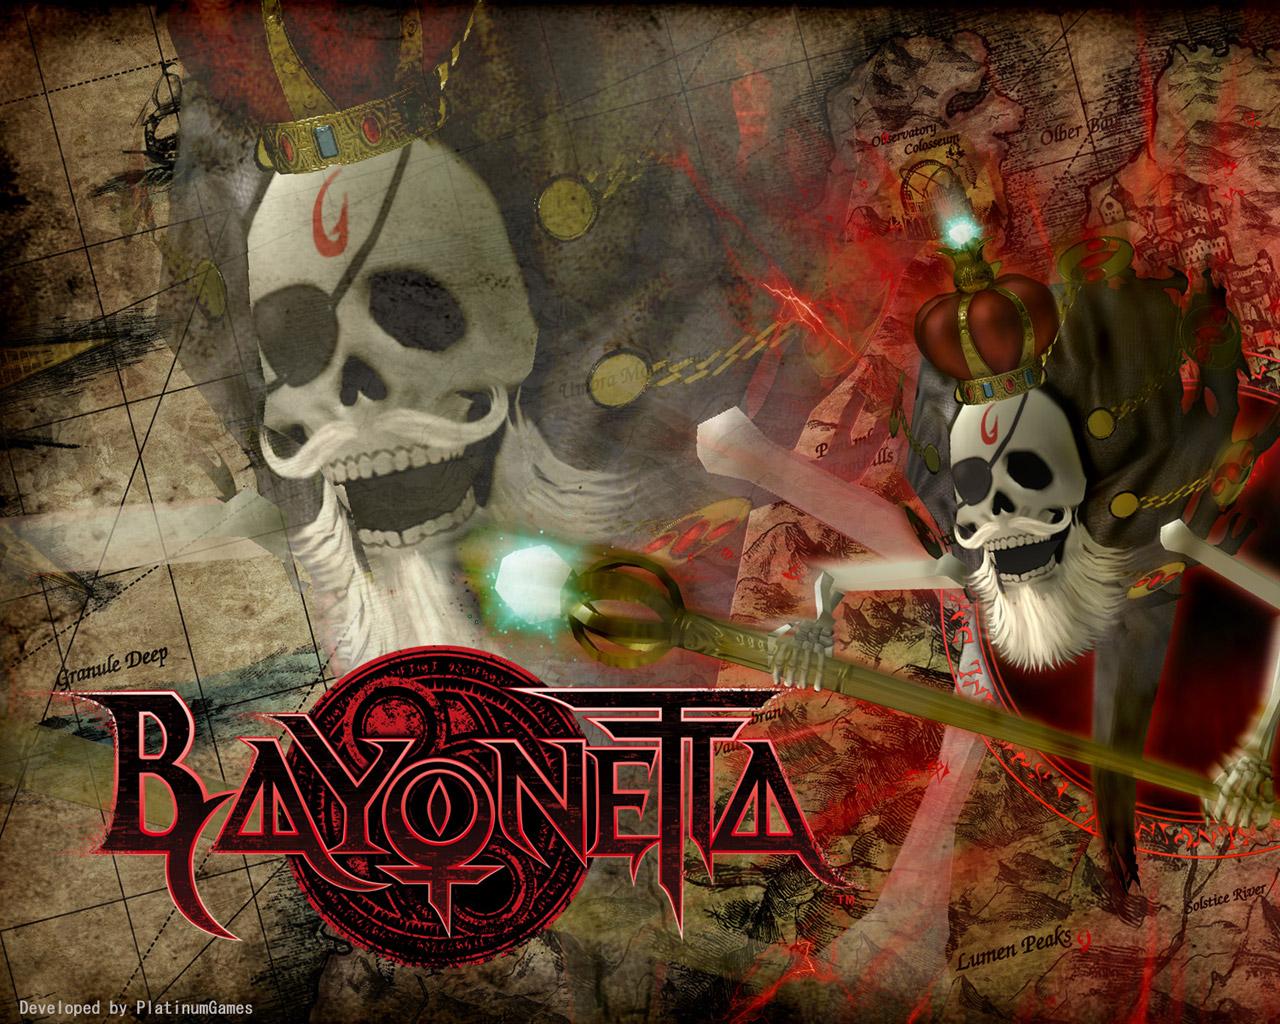 Bayonetta Wallpaper in 1280x1024